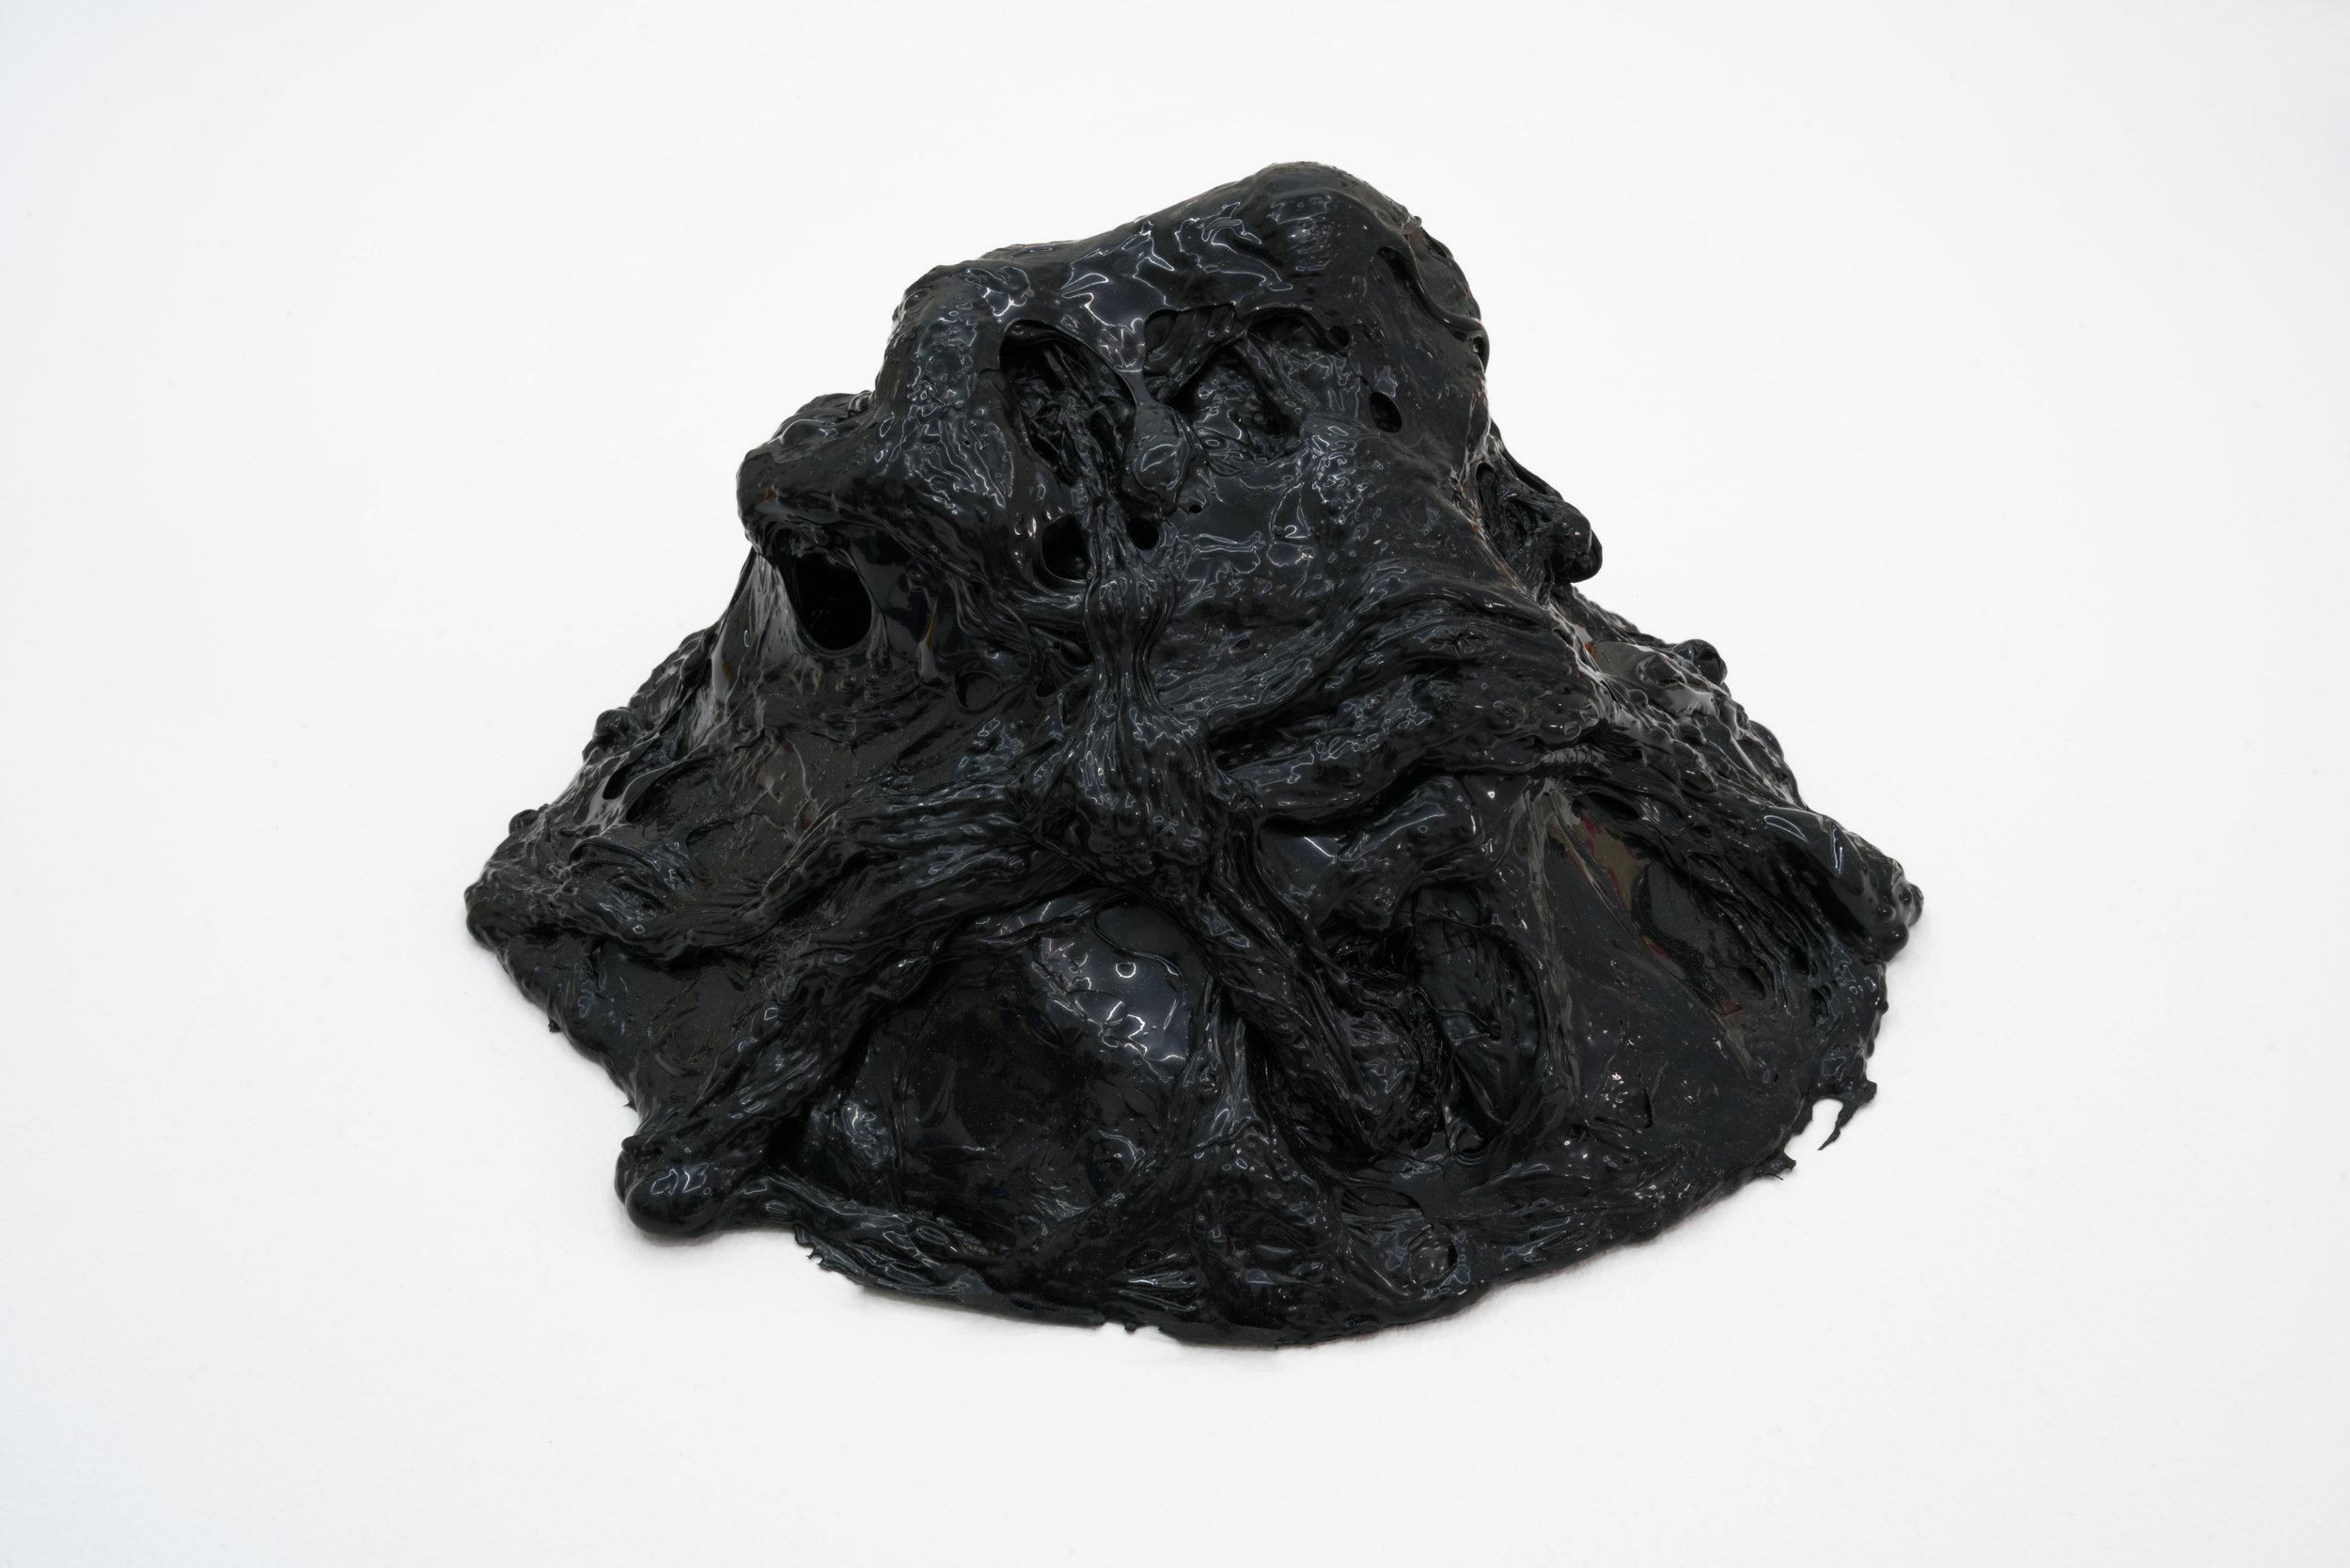 Remko Scha,  Plastic Meltdown , 1962-1992, Plastic, 13 x 24 x 23 cm